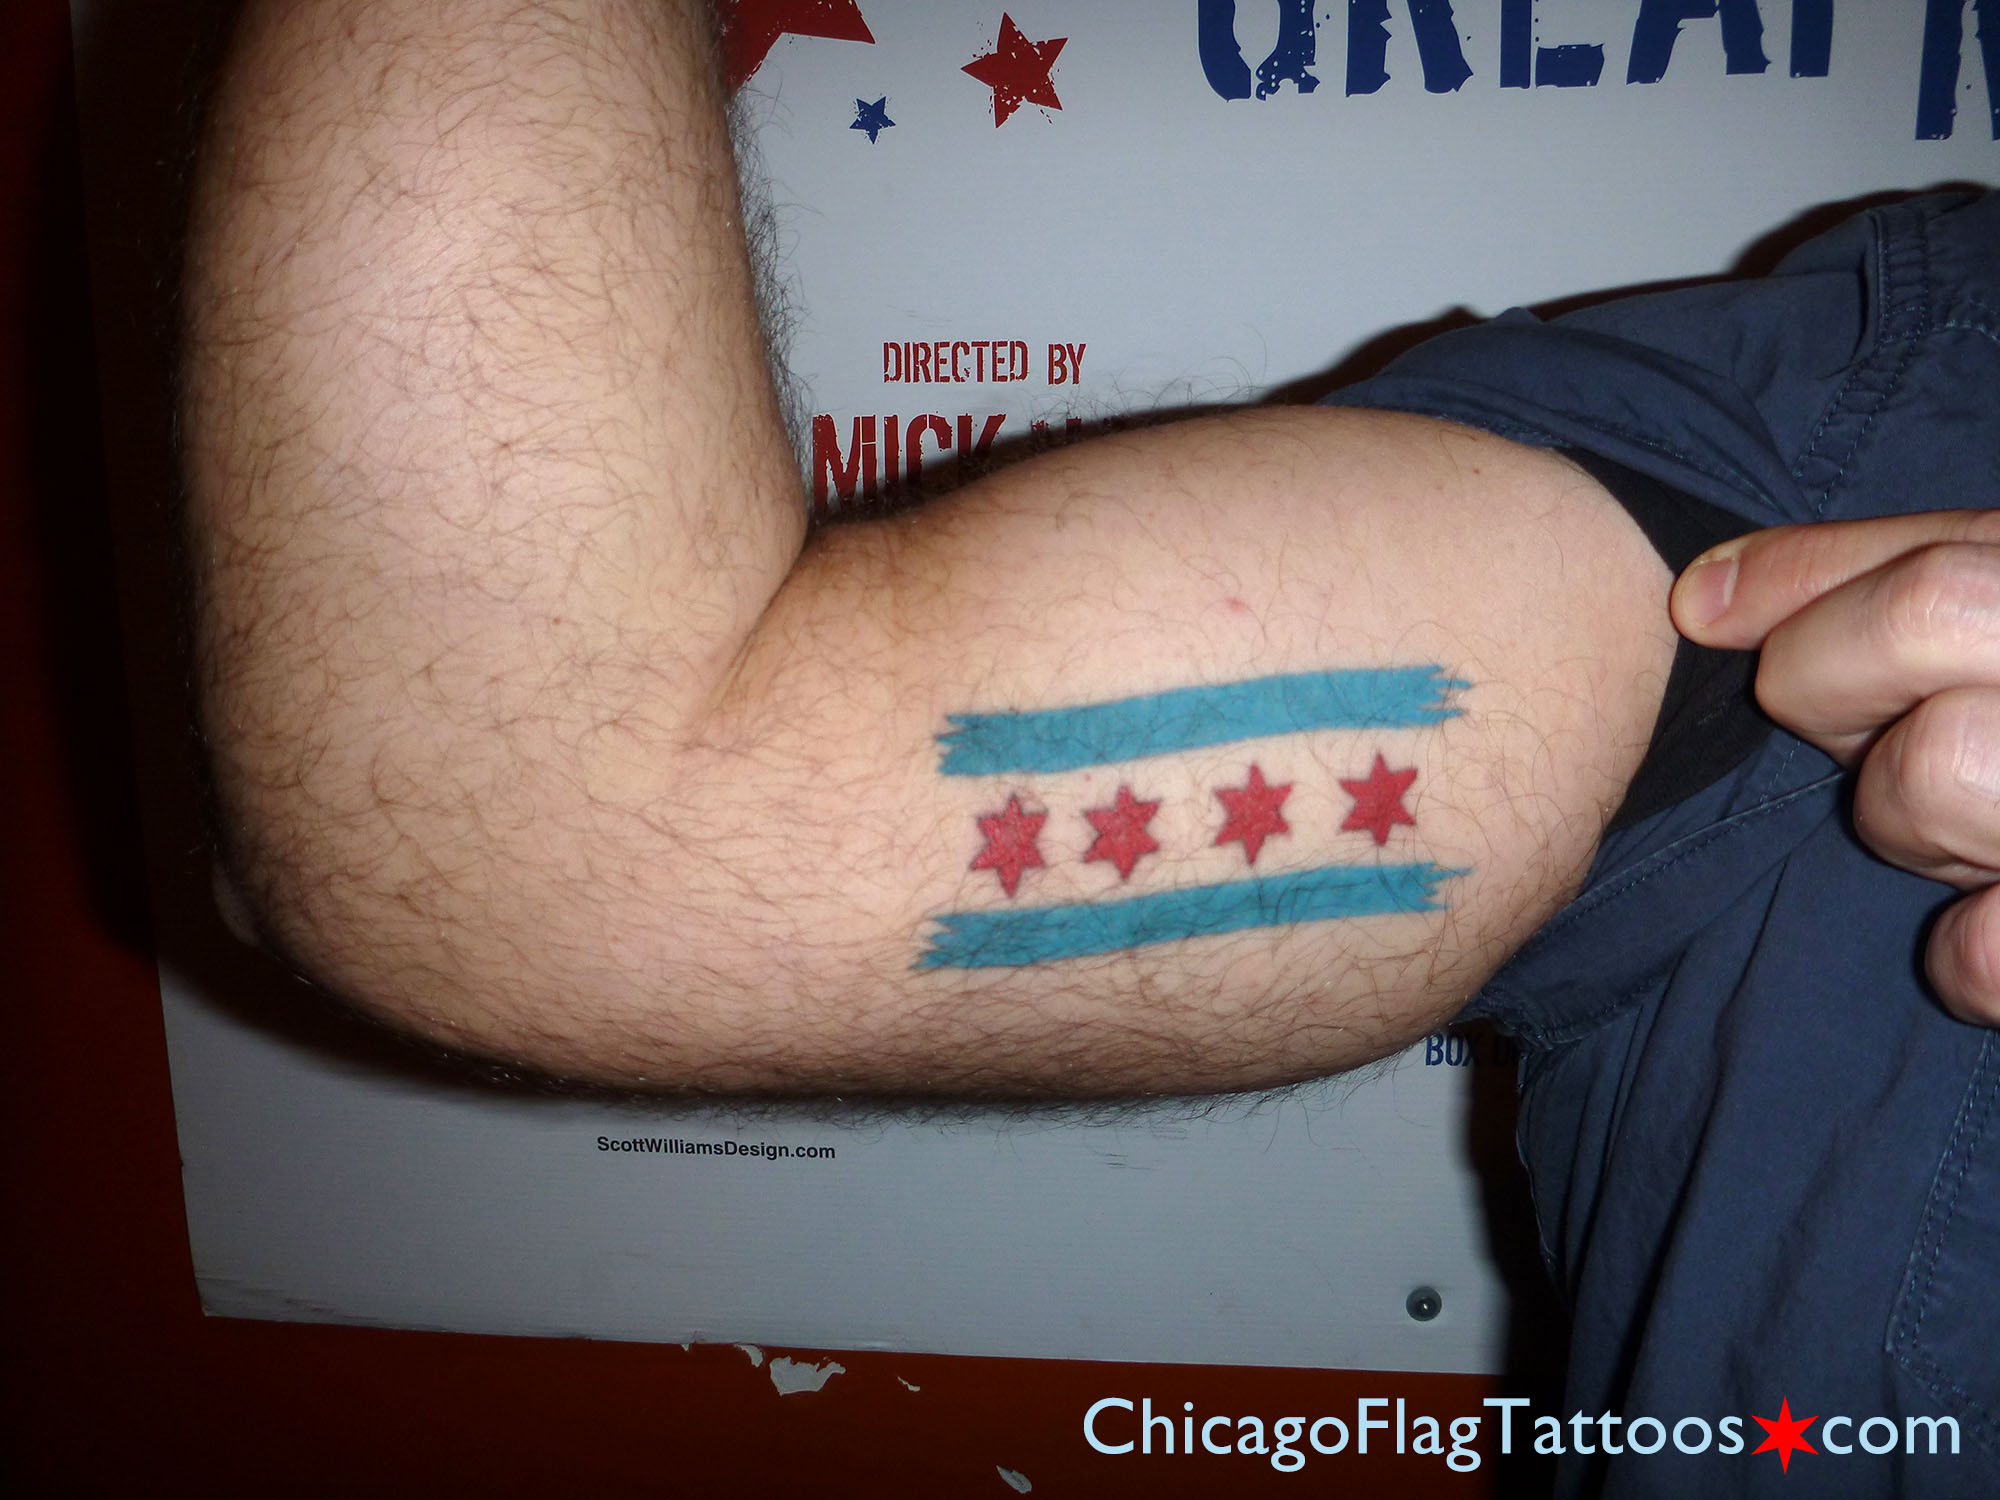 http://chicagoflagtattoos.com/img/tim_chidester_chicago_flag_tattoo.jpg